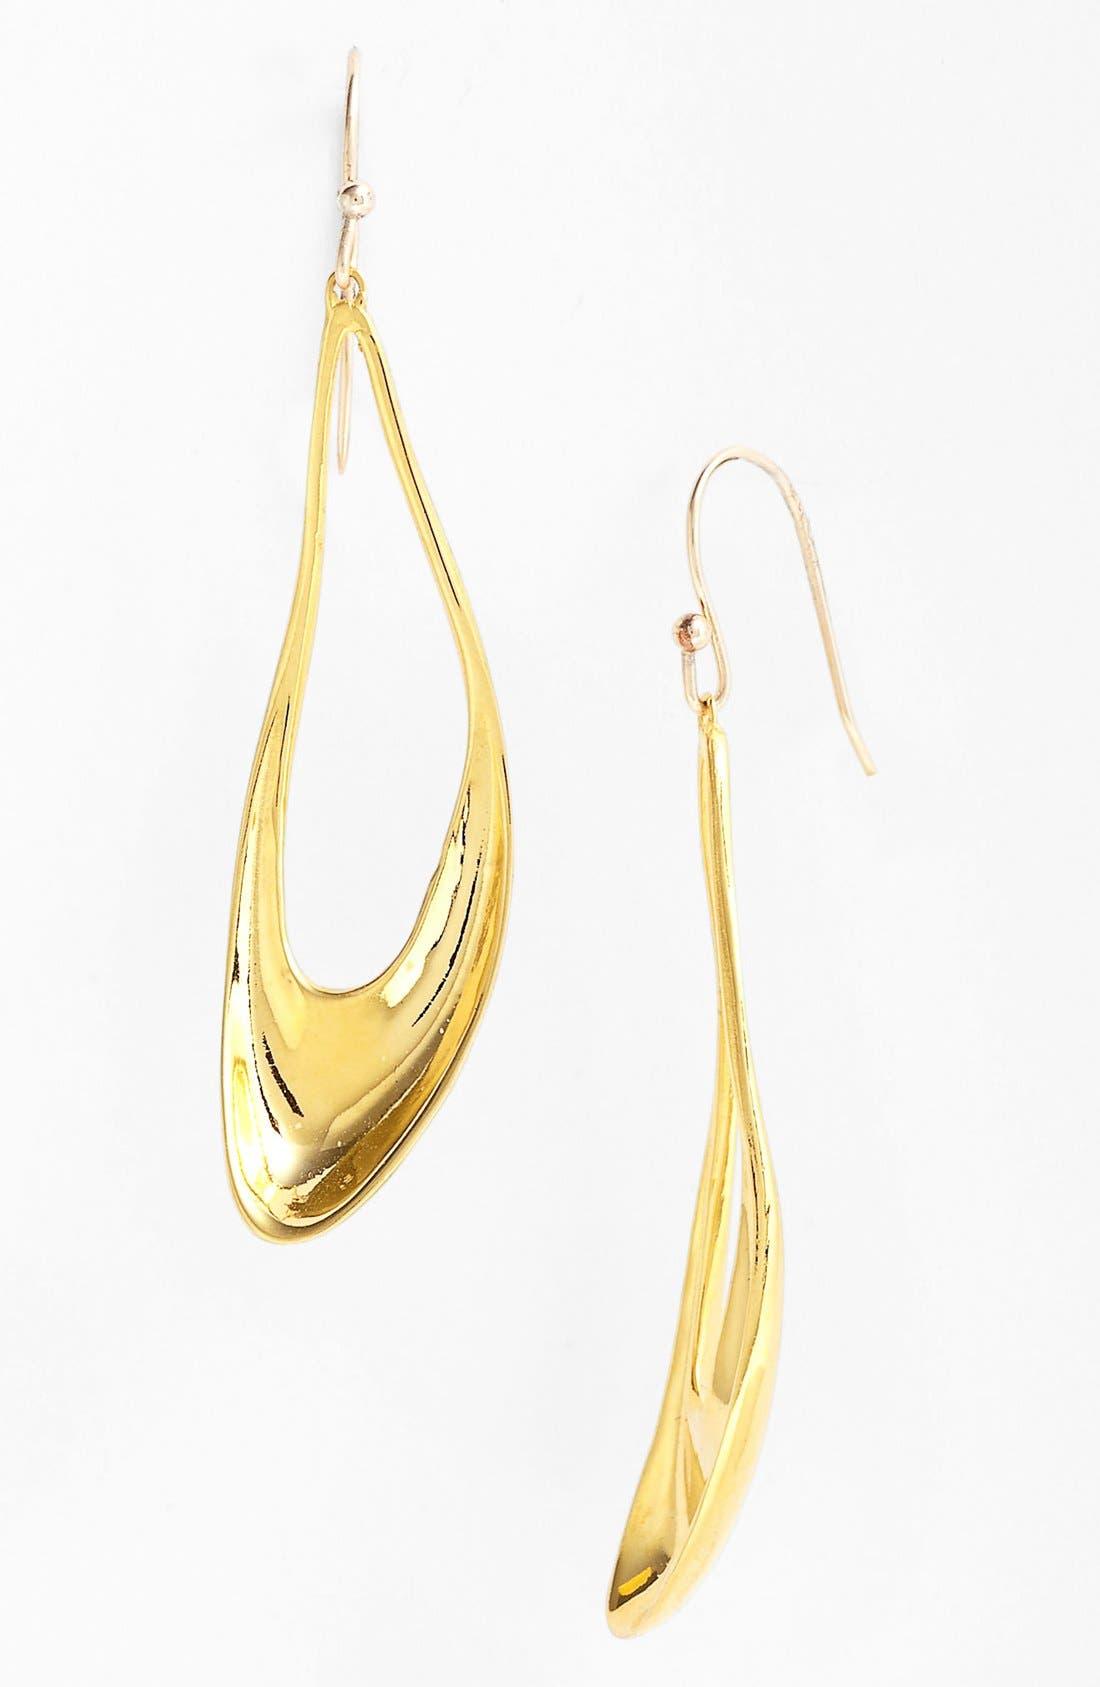 Main Image - Alexis Bittar 'Miss Havisham - Liquid Gold' Open Teardrop Earrings